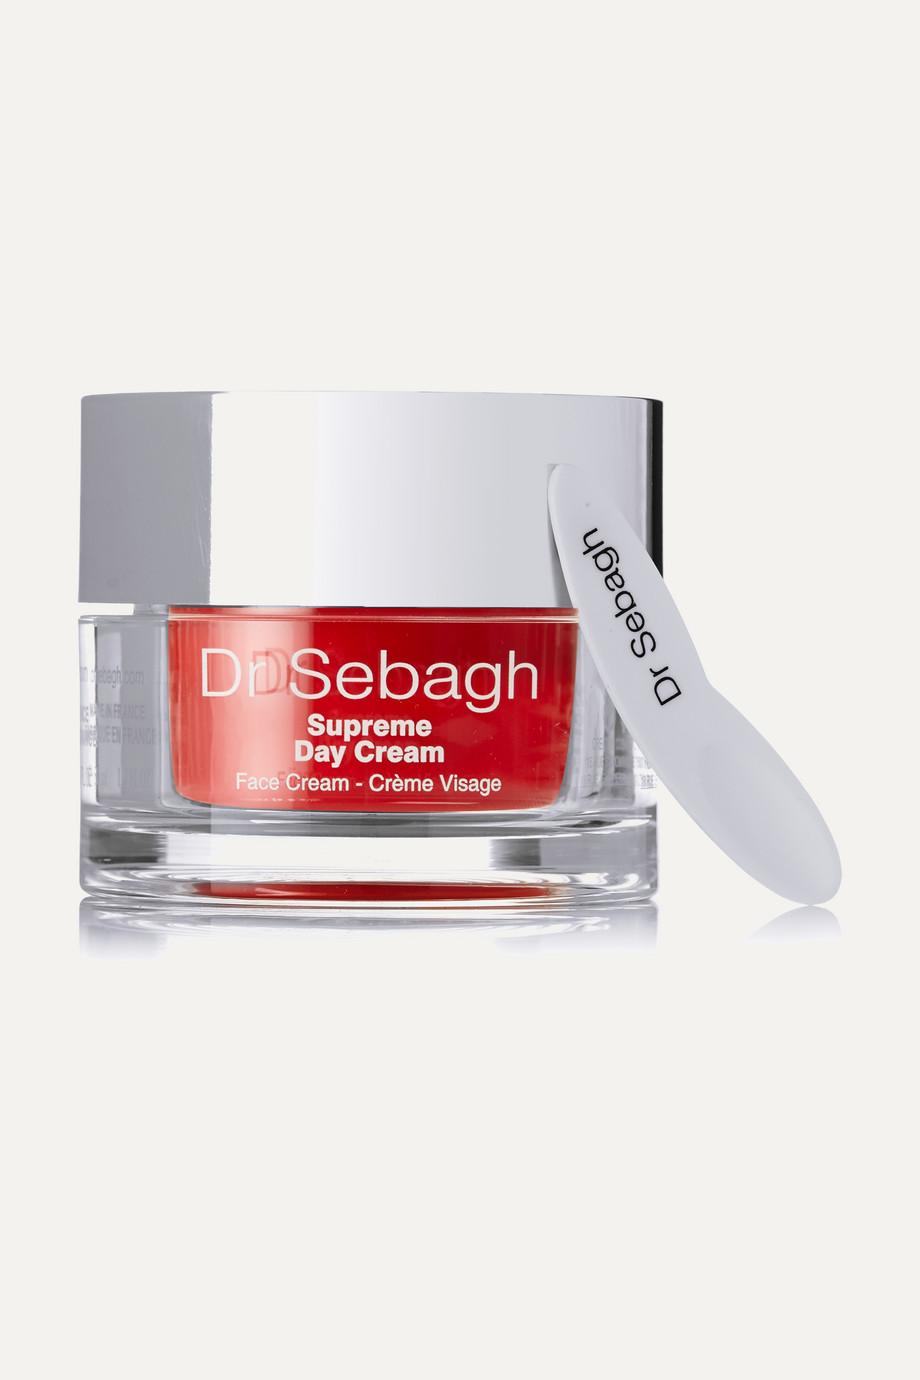 Dr Sebagh Supreme Day Cream, 50ml